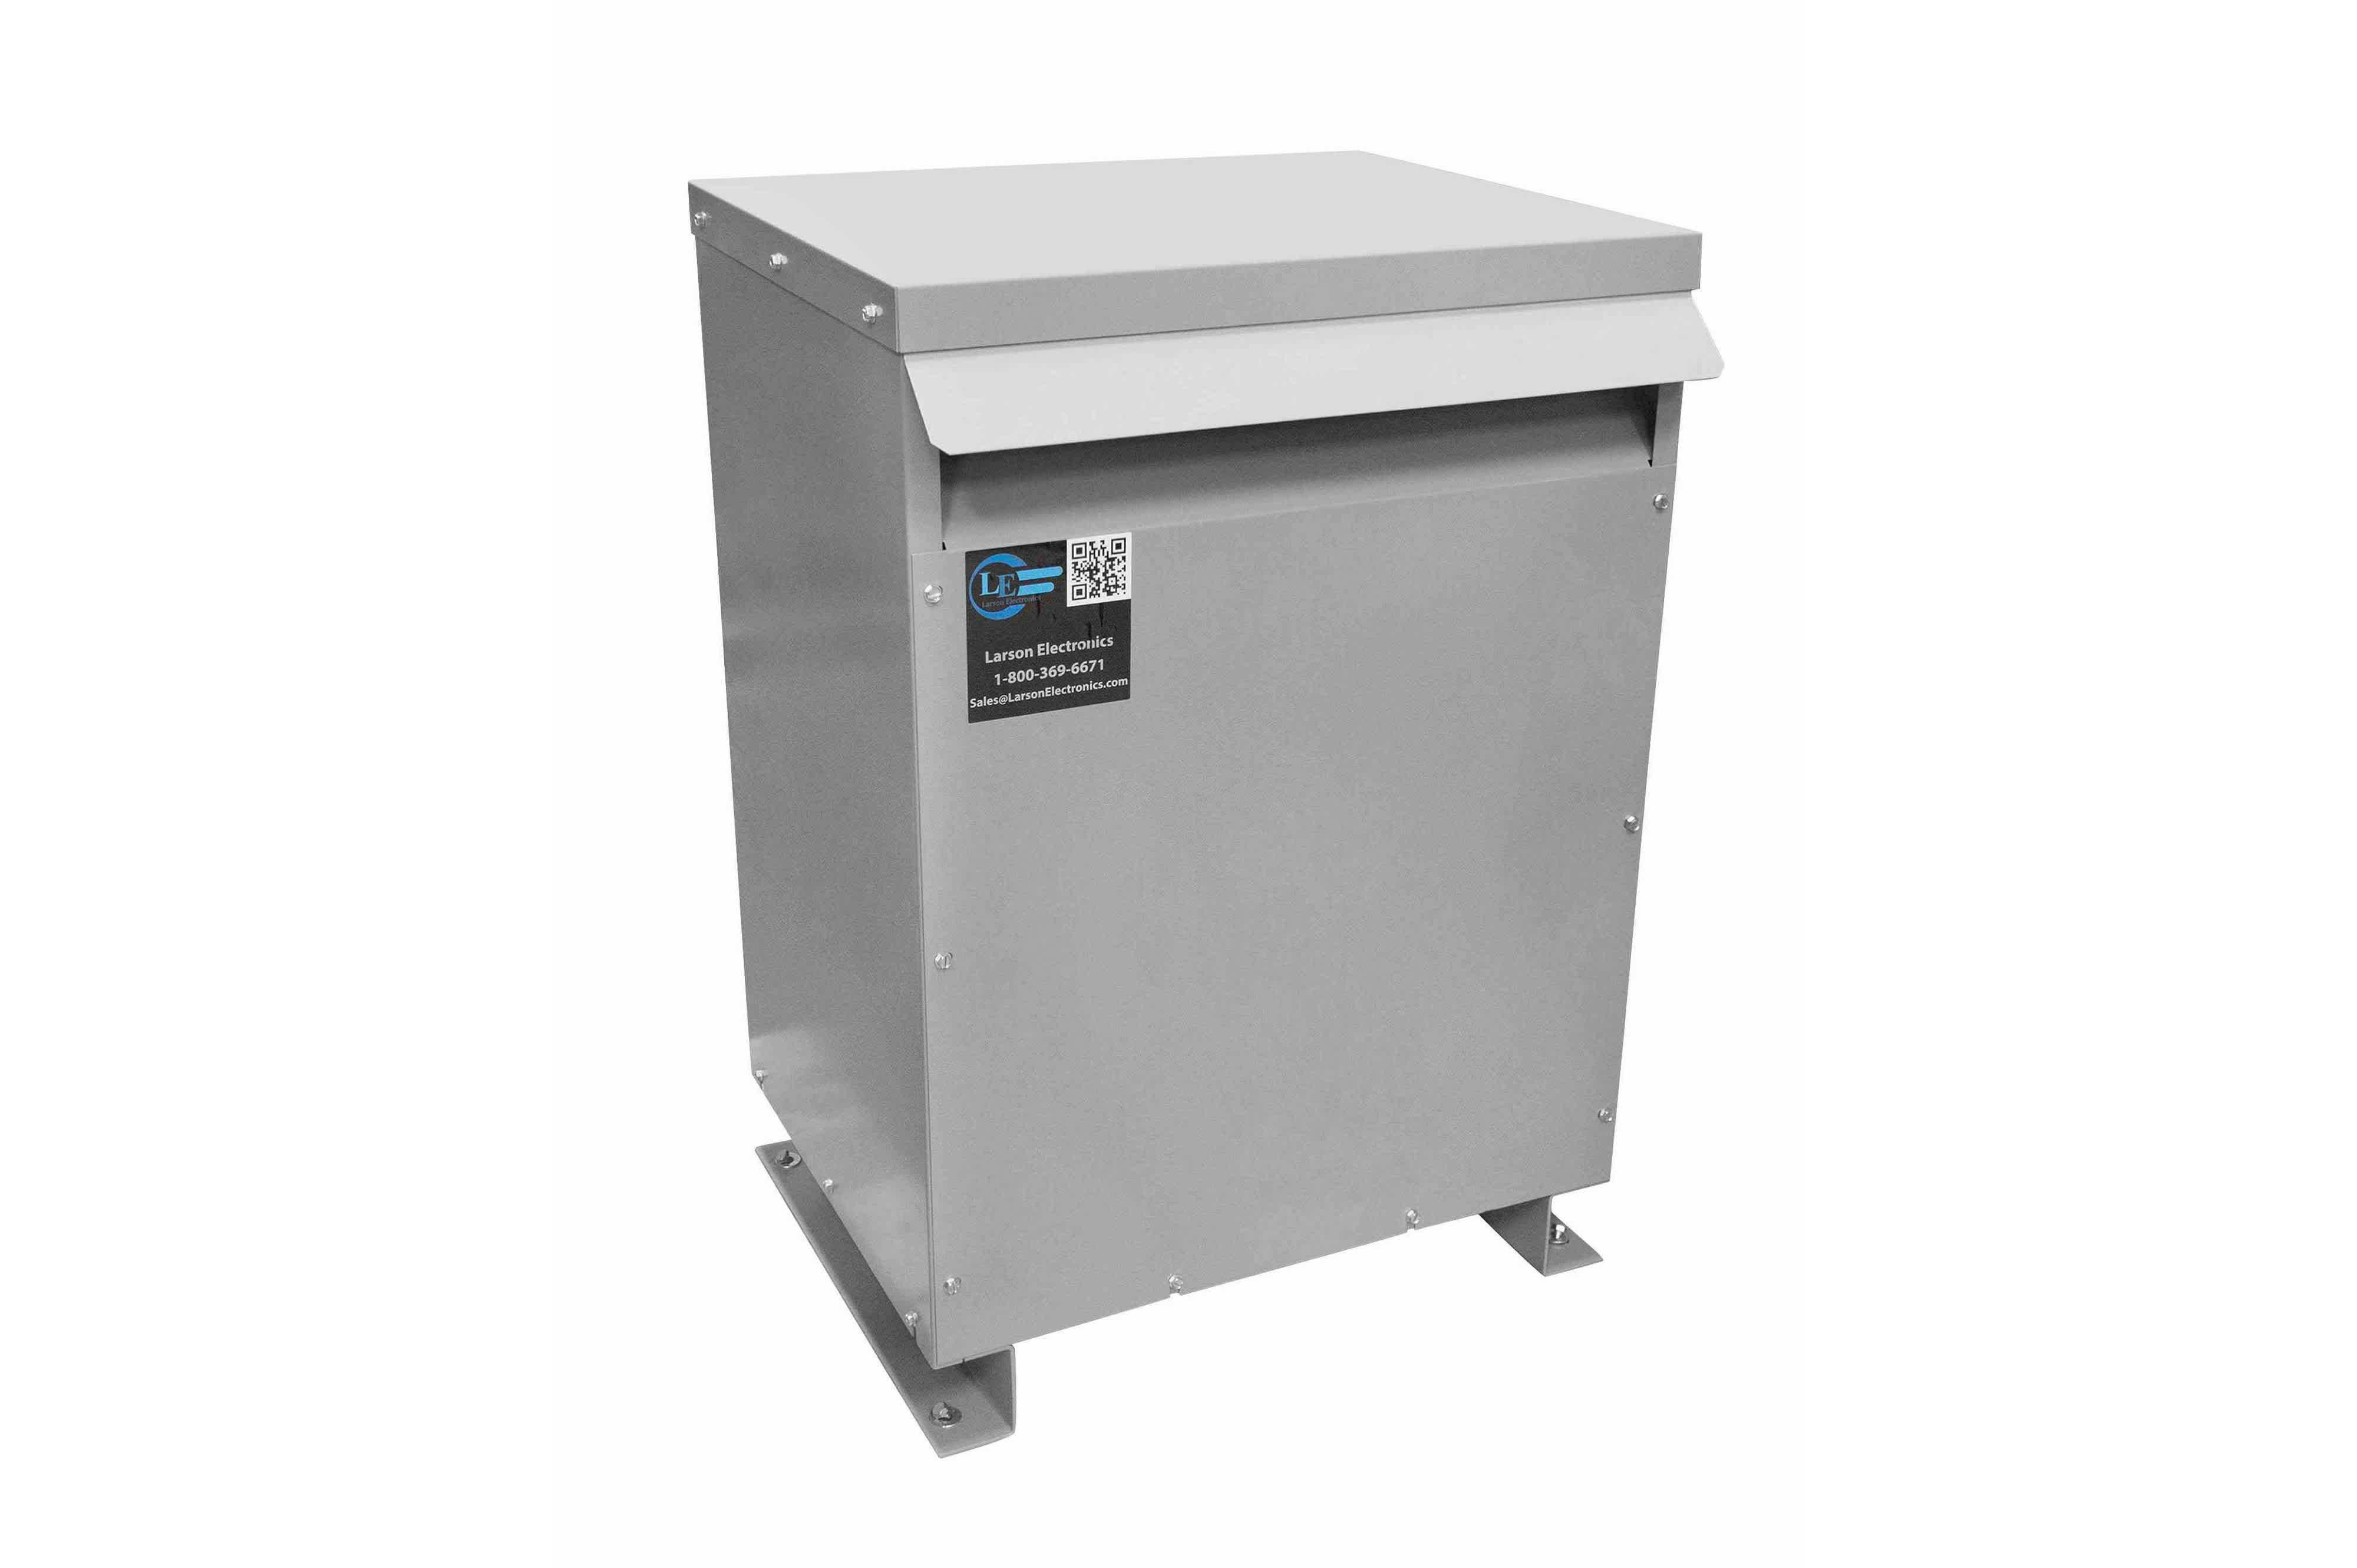 700 kVA 3PH Isolation Transformer, 460V Wye Primary, 380Y/220 Wye-N Secondary, N3R, Ventilated, 60 Hz